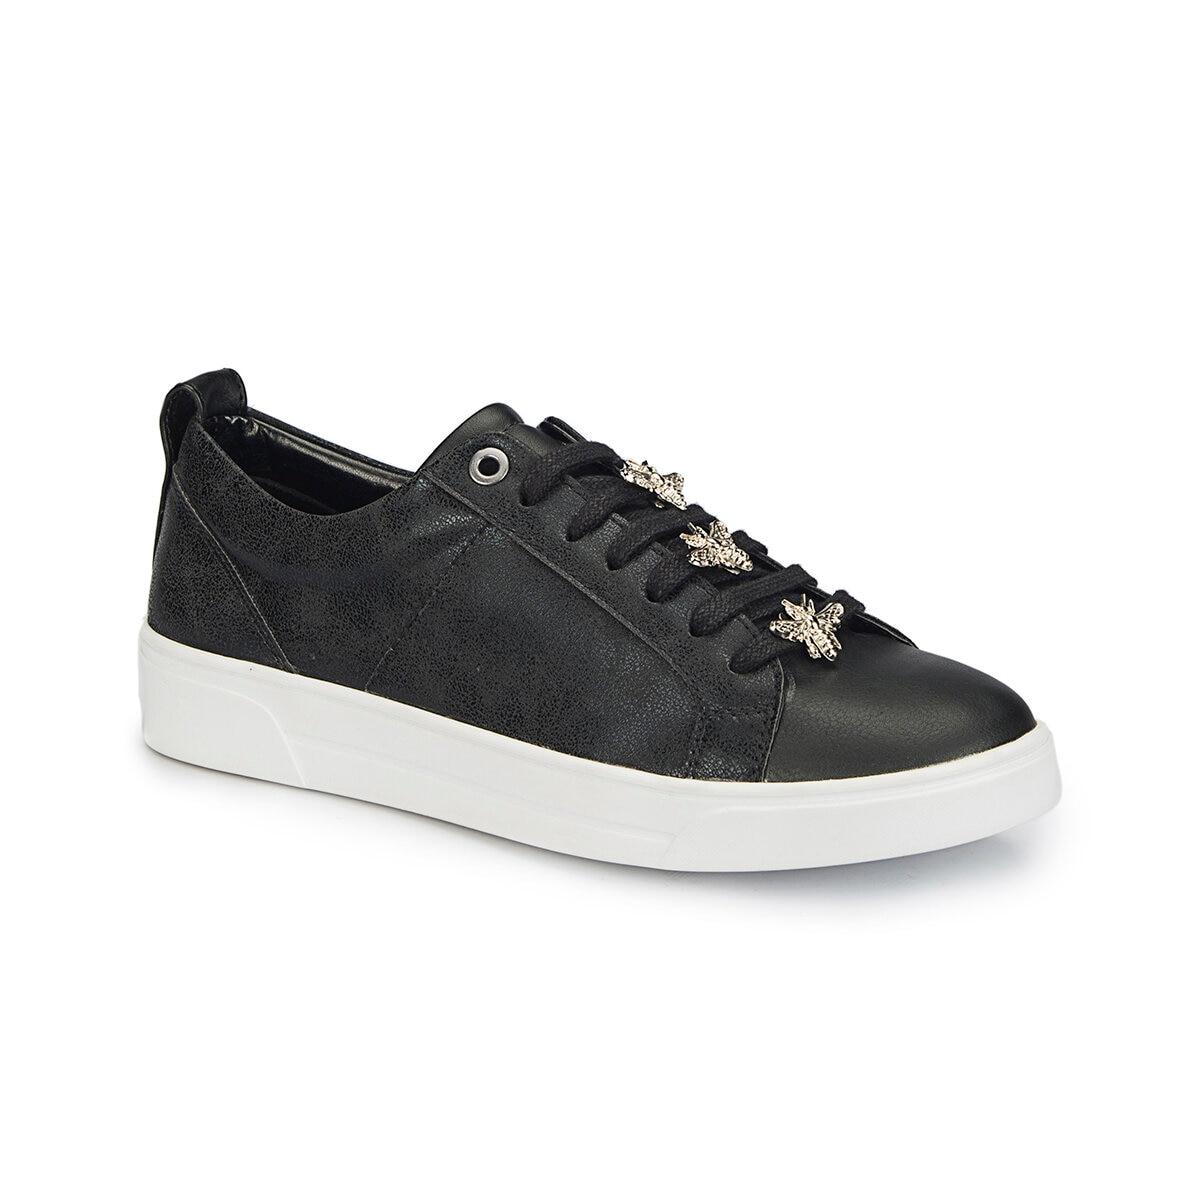 FLO 81.311431.Z Black Women Shoes Polaris